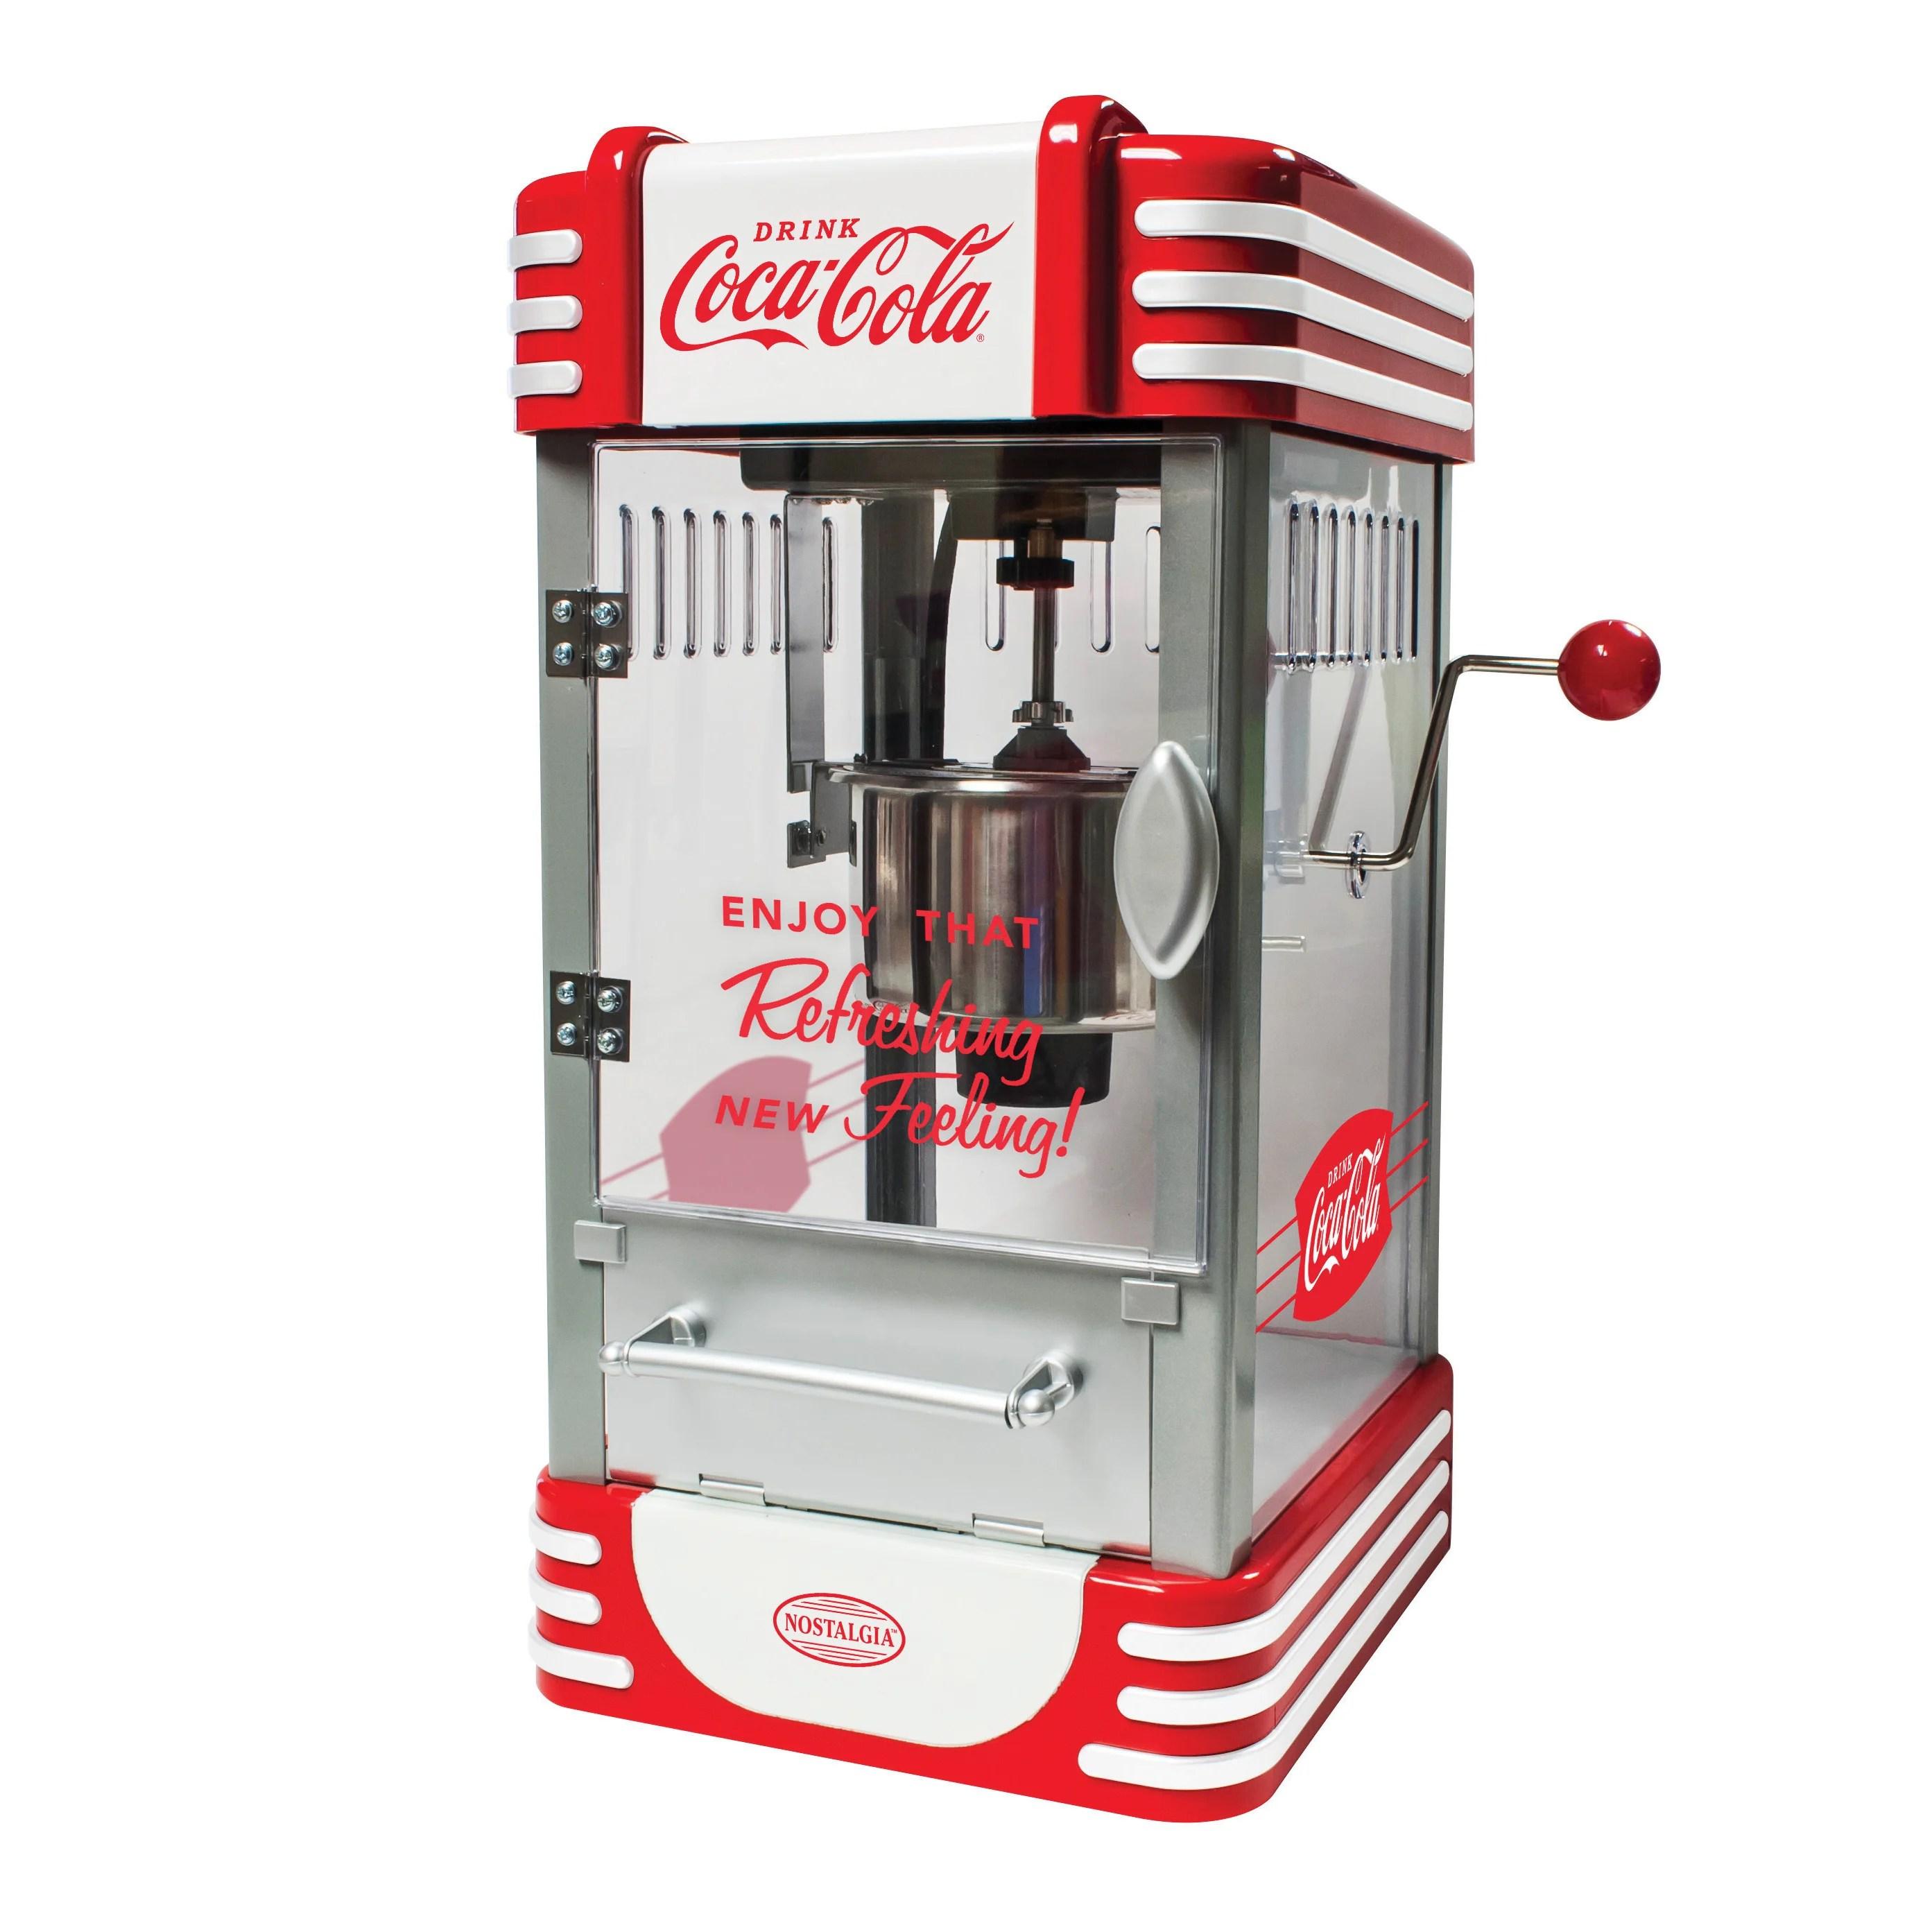 Coca Cola Bathroom Decor - talentneeds.com -